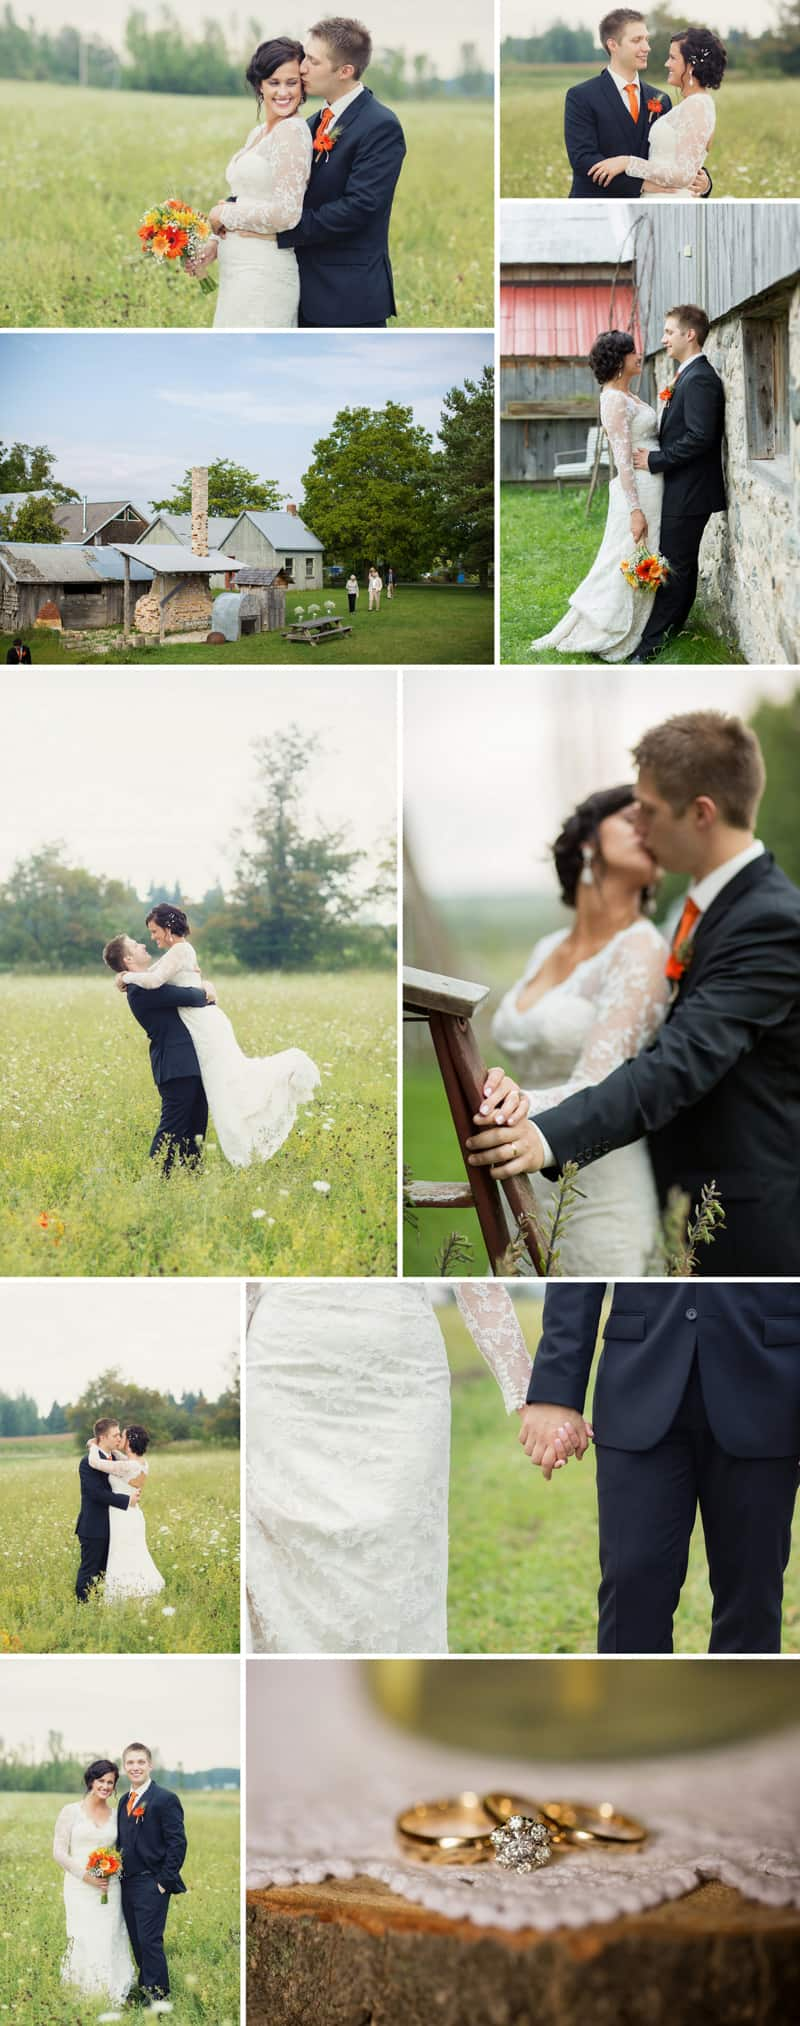 A Romantic Fall Wedding in a Rustic Barn 7